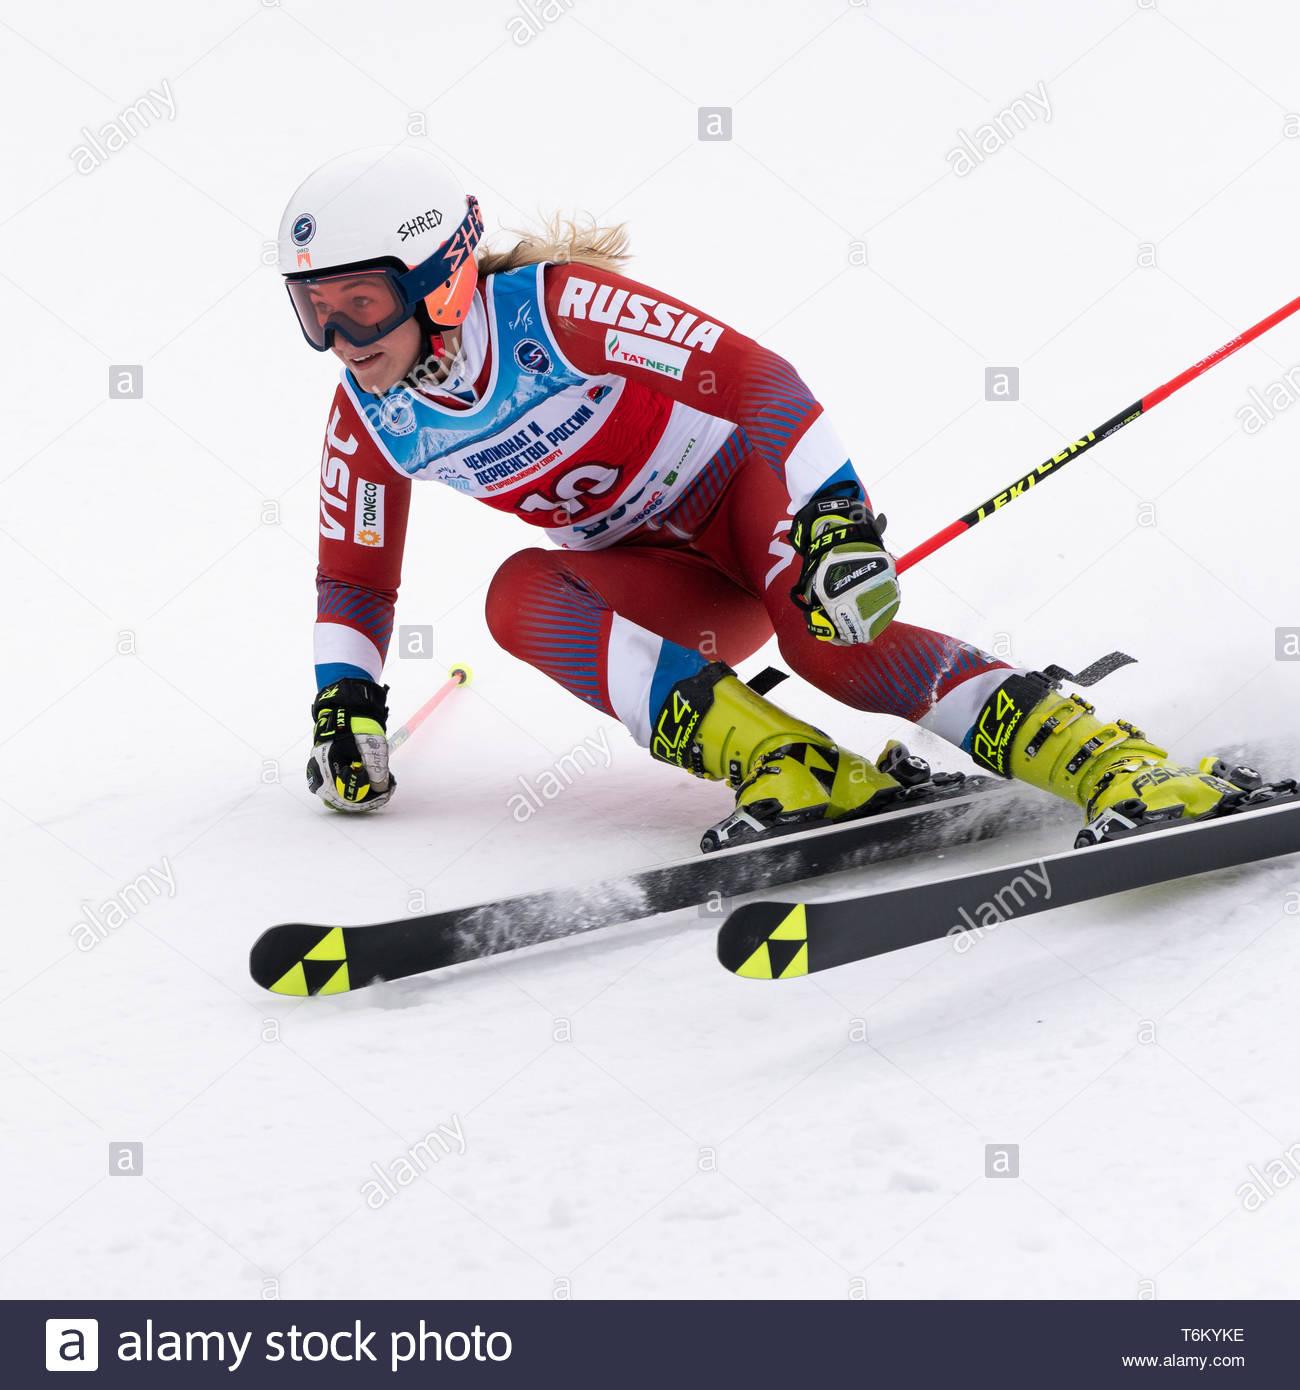 KAMCHATKA PENINSULA, RUSSIA - APR 2, 2019: Mountain skier Rinata Abdulkayumova (Kamchatka) skiing down mount. International Ski Federation Championshi - Stock Image